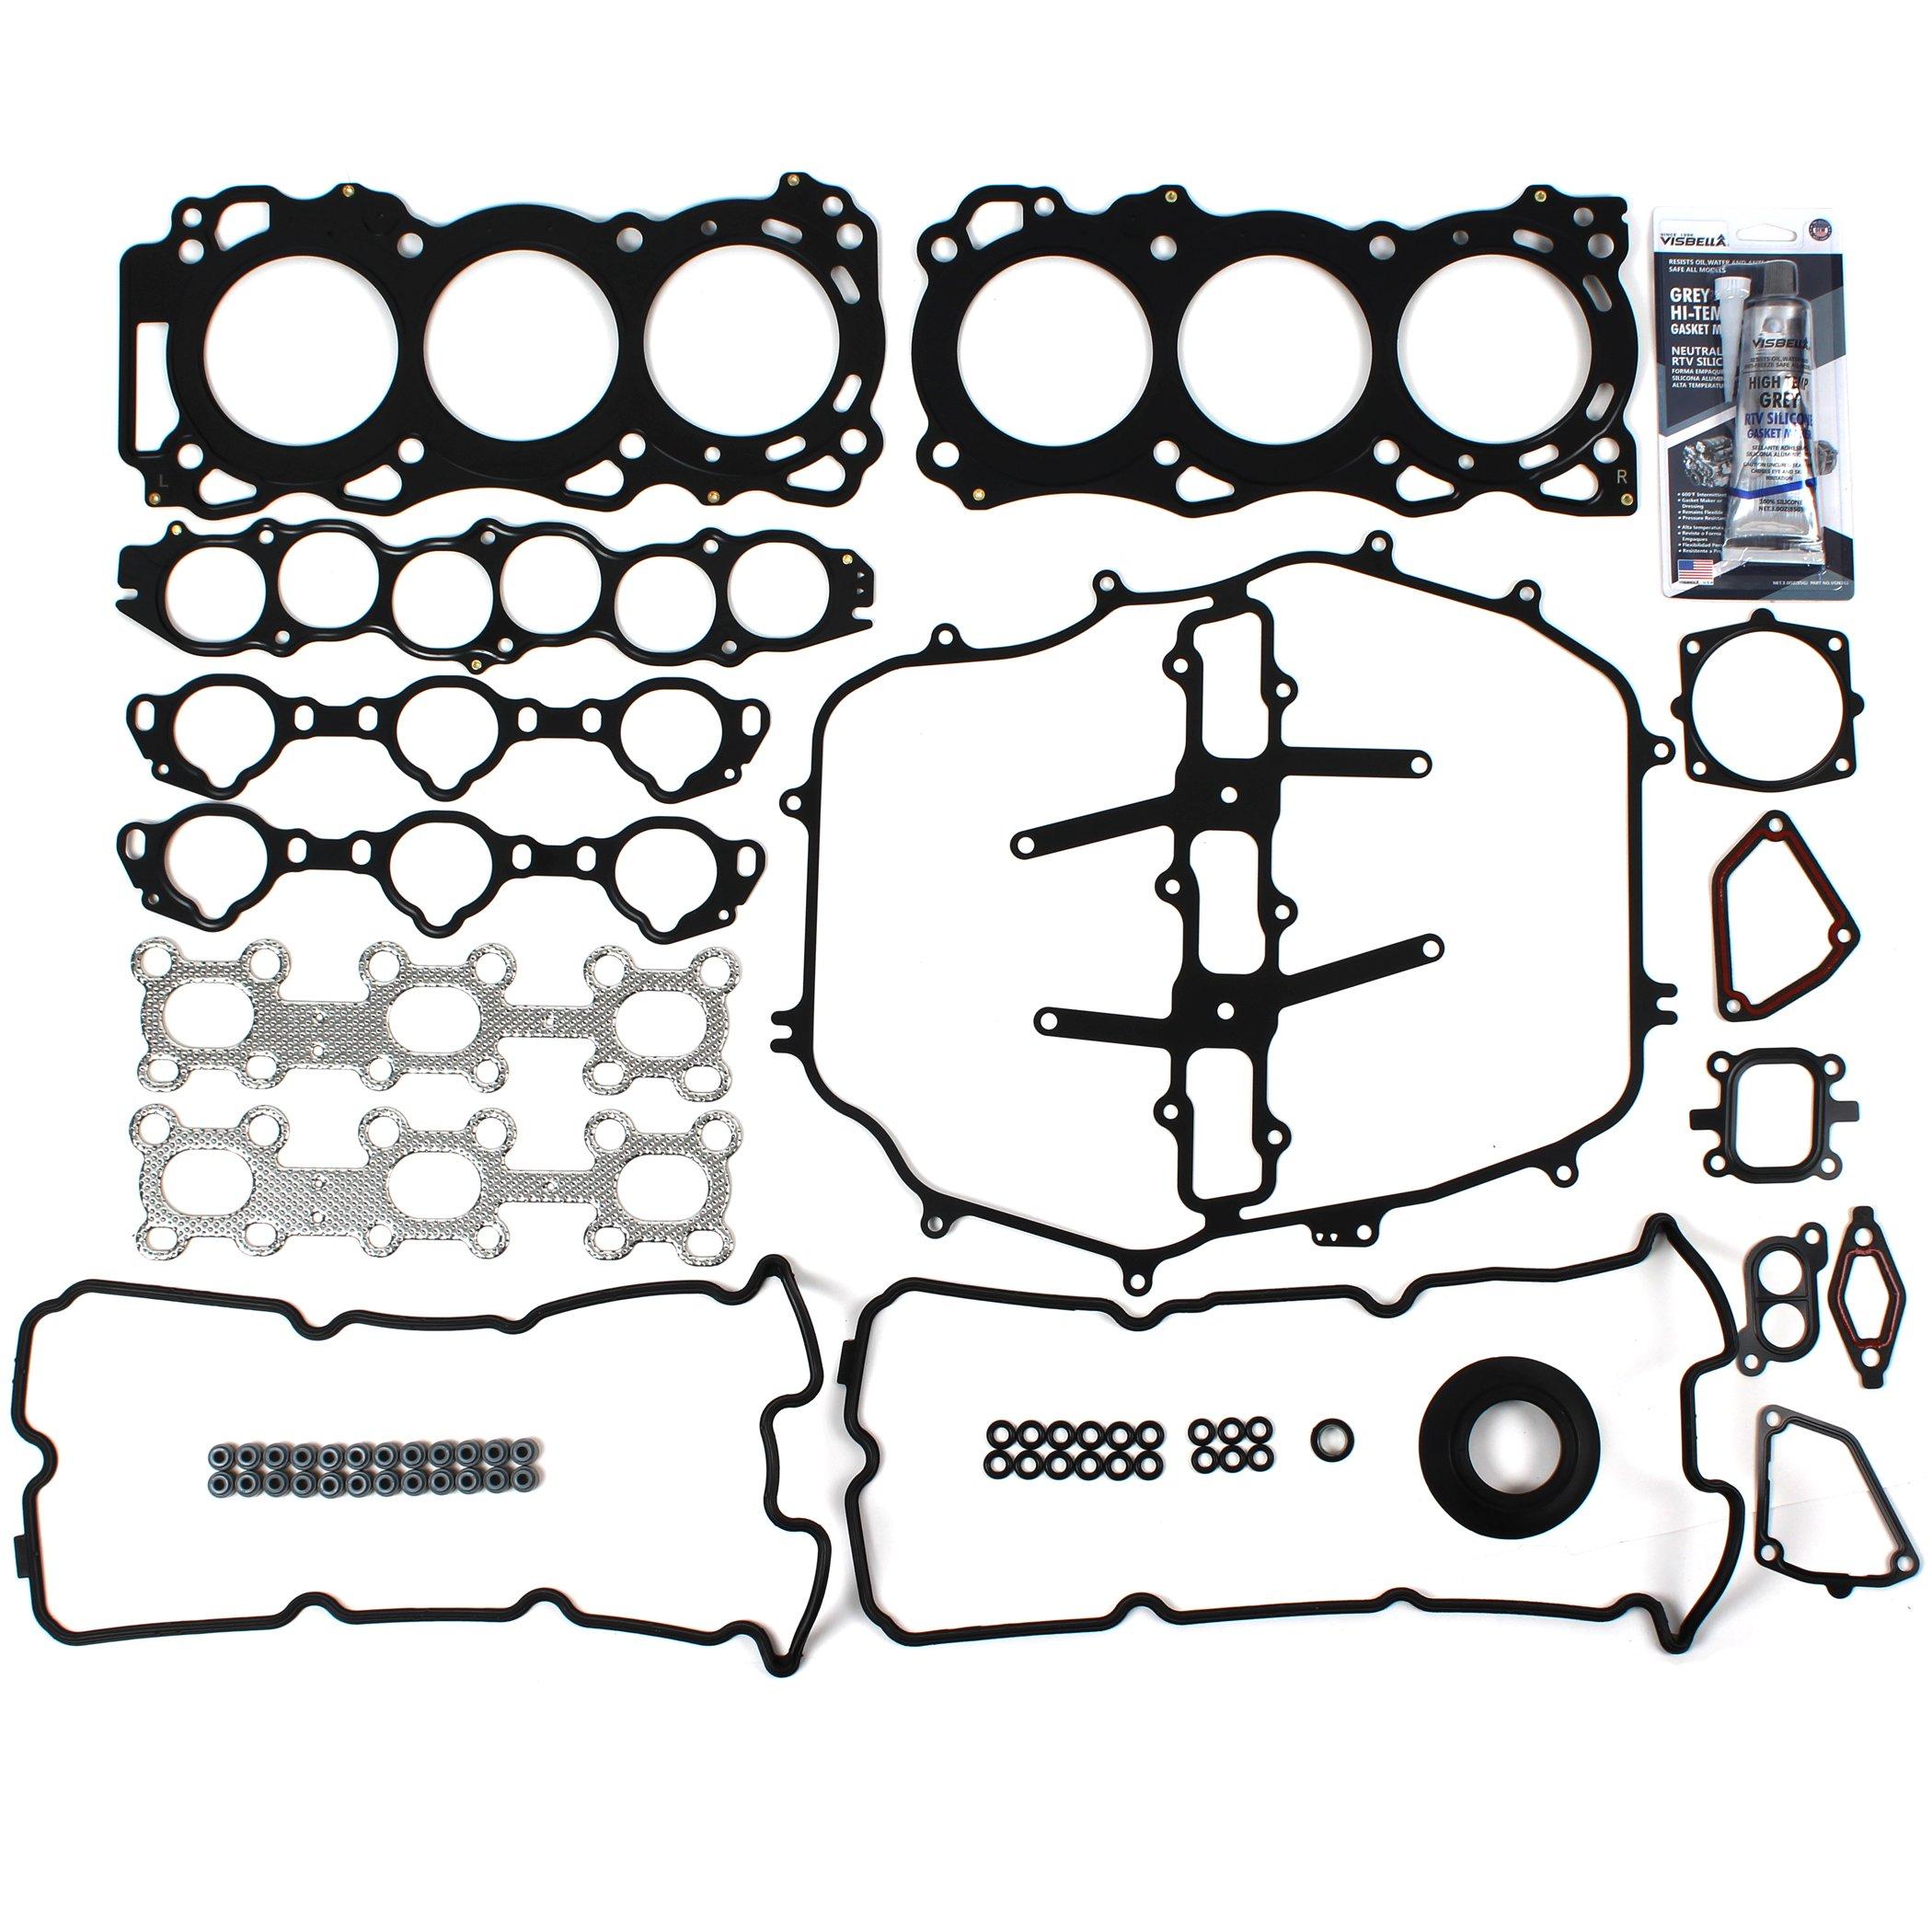 CH90301 MLS Head Gasket Set for 3.5L V6 Nissan 350Z/Infiniti FX35 Base G35 Base & X M35 Base Sport X VQ35DE Engine